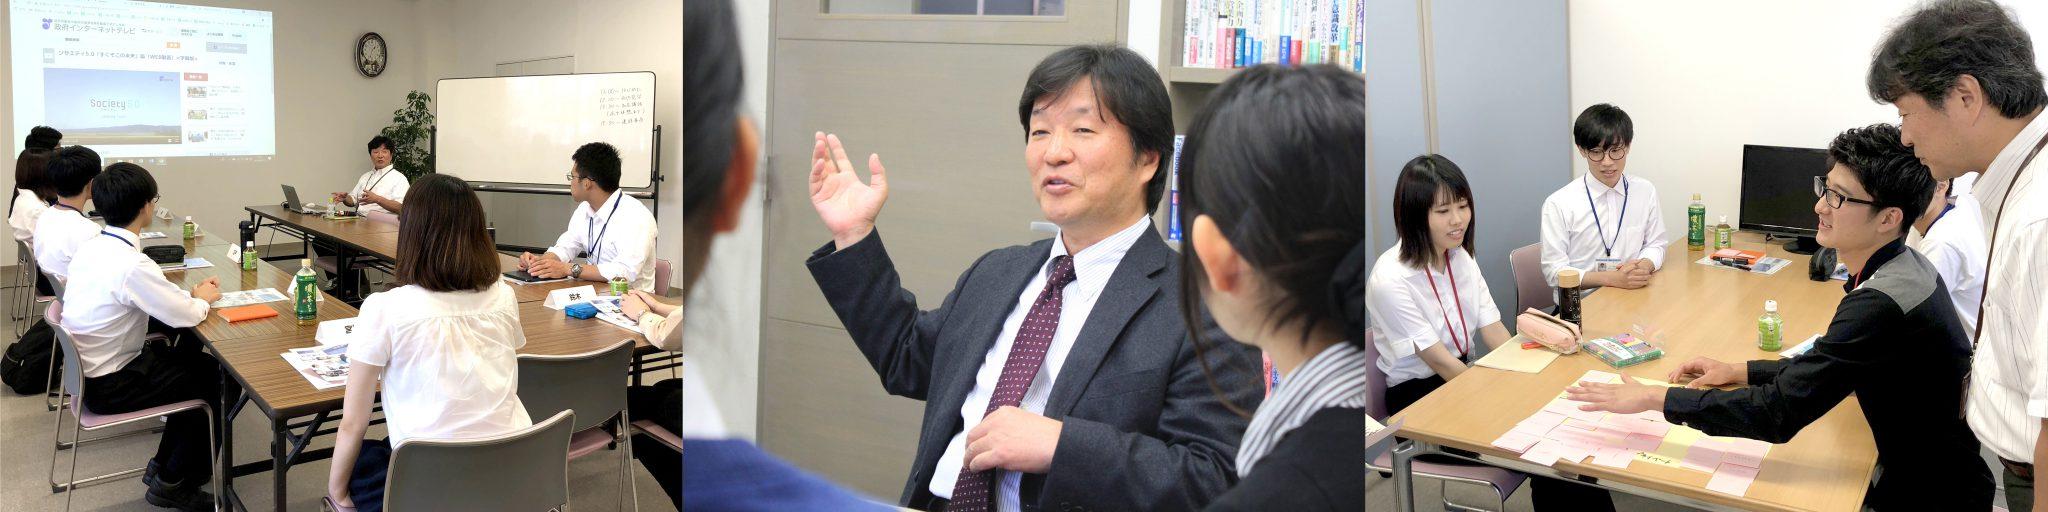 IT企業研究会